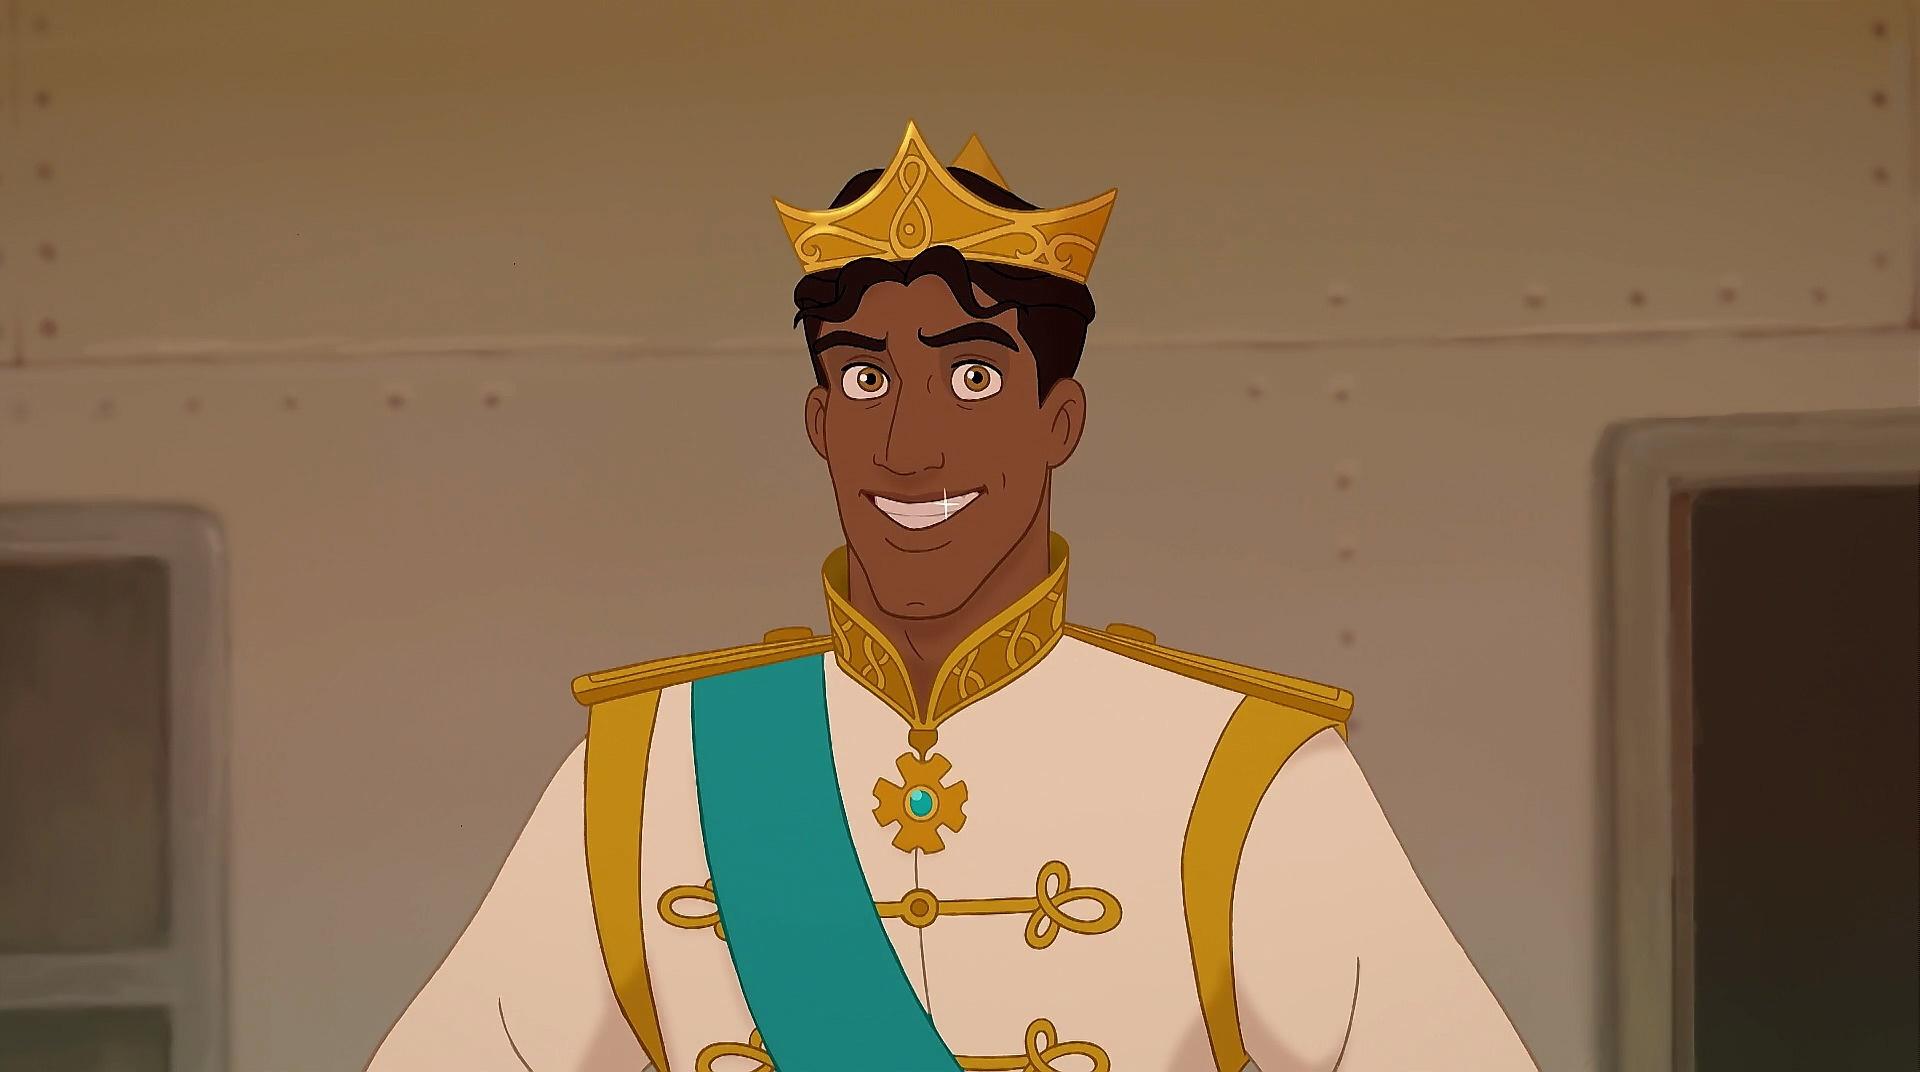 Prince Naveen Disney Wiki Fandom